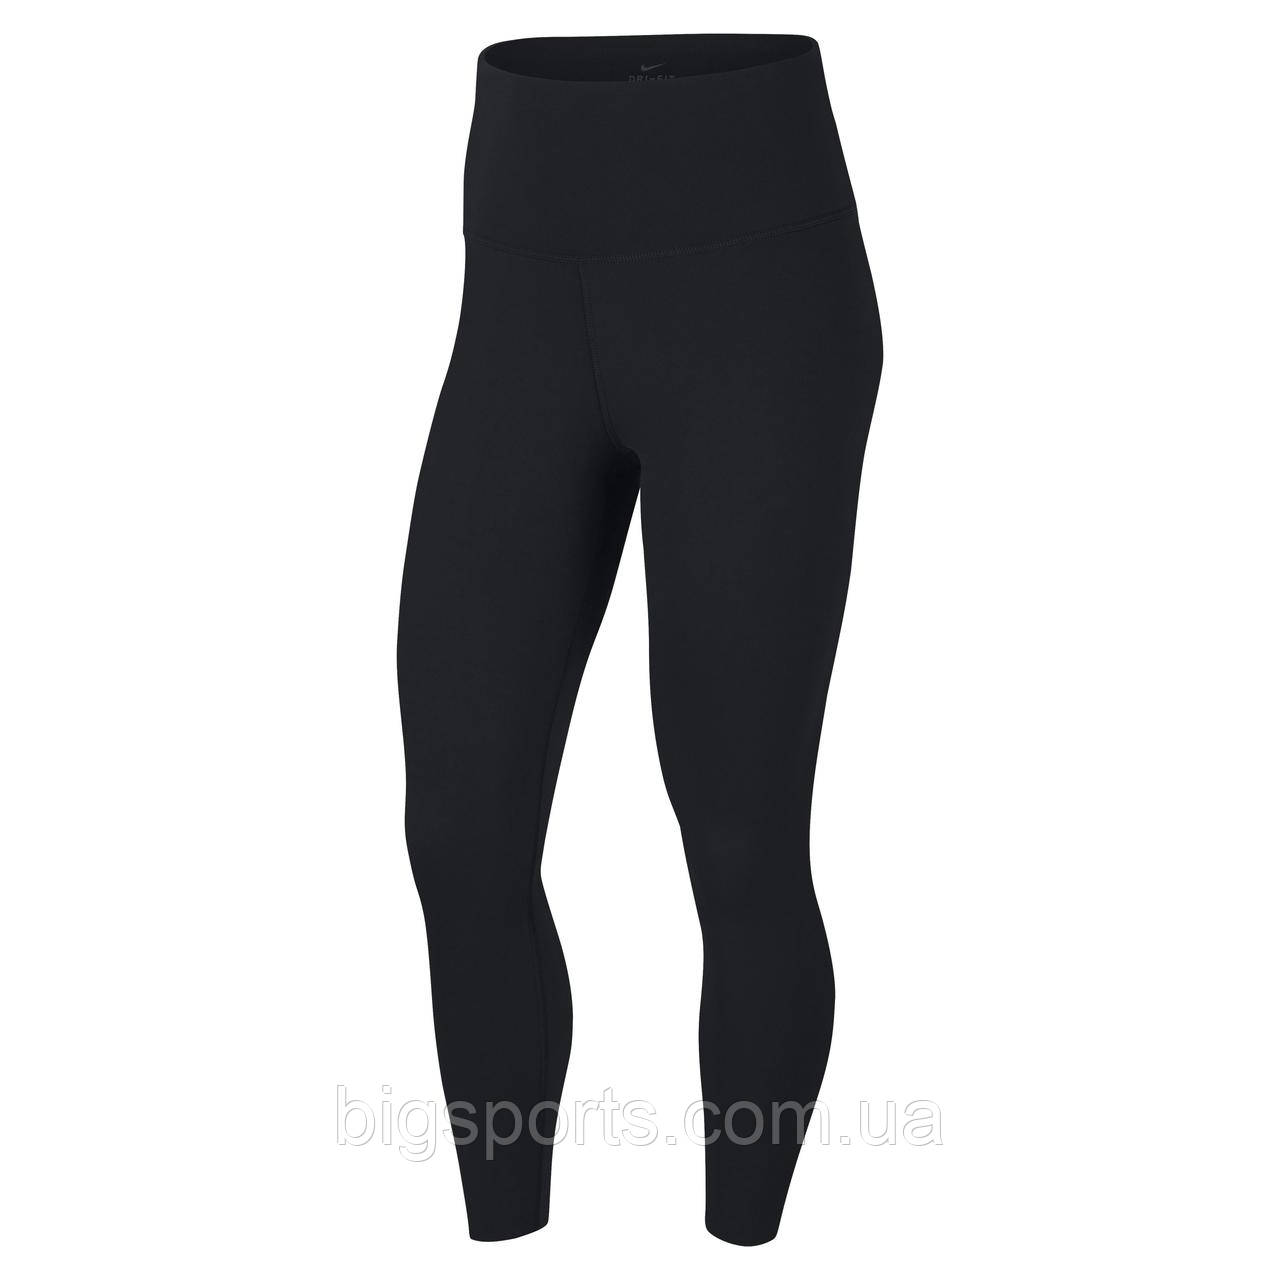 Лосины жен. Nike Yoga Luxe 7/8 Tight (арт. CJ3801-010)